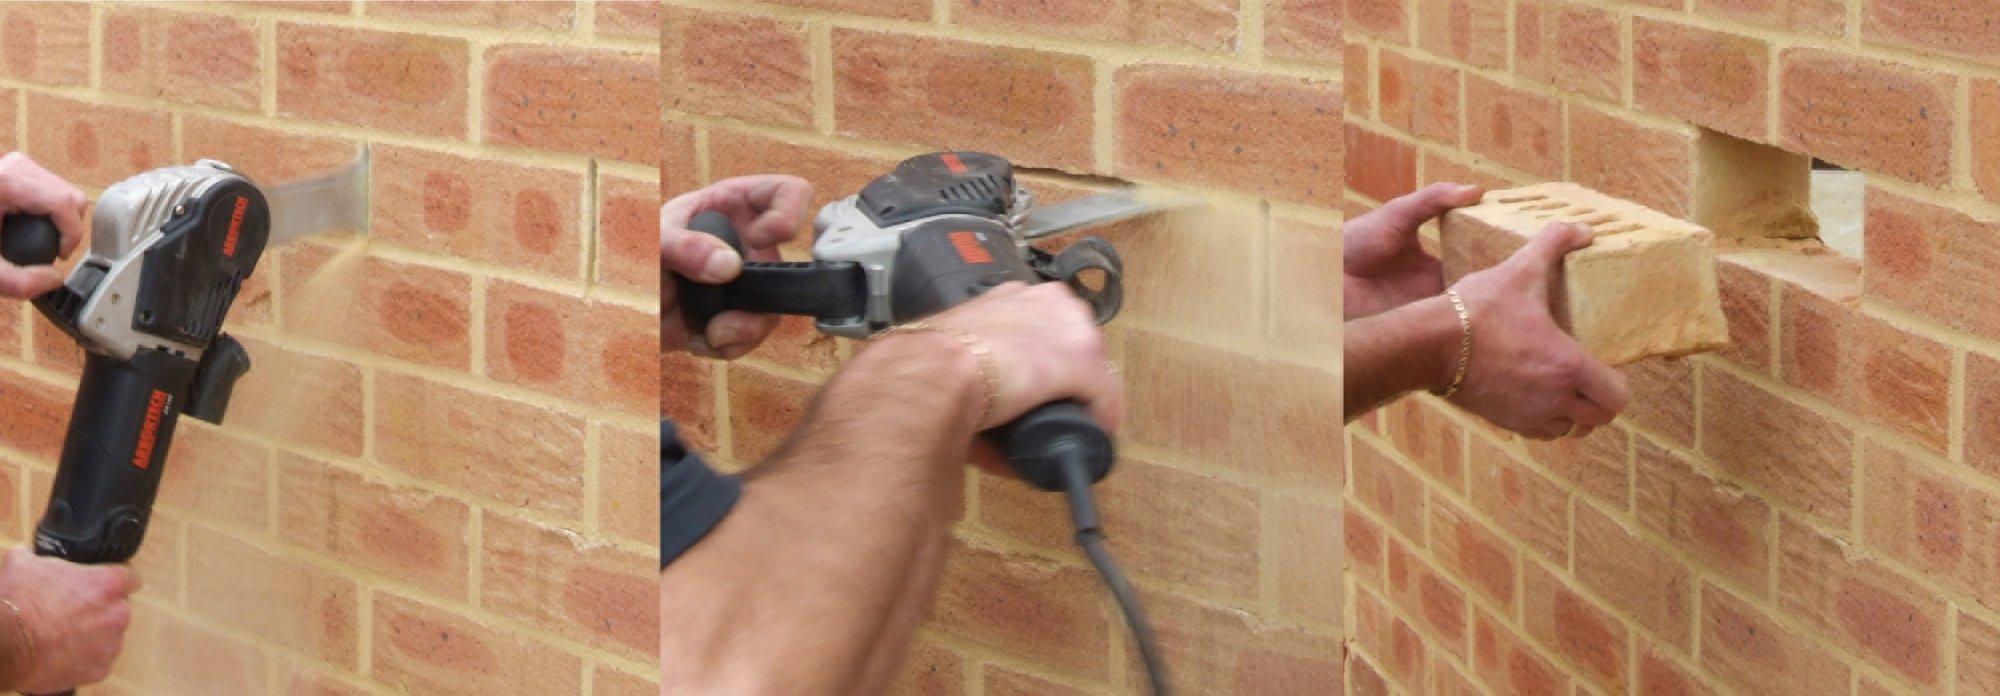 Arbortech AS170 Brick and Mortar Saw by Arbortech (Image #4)